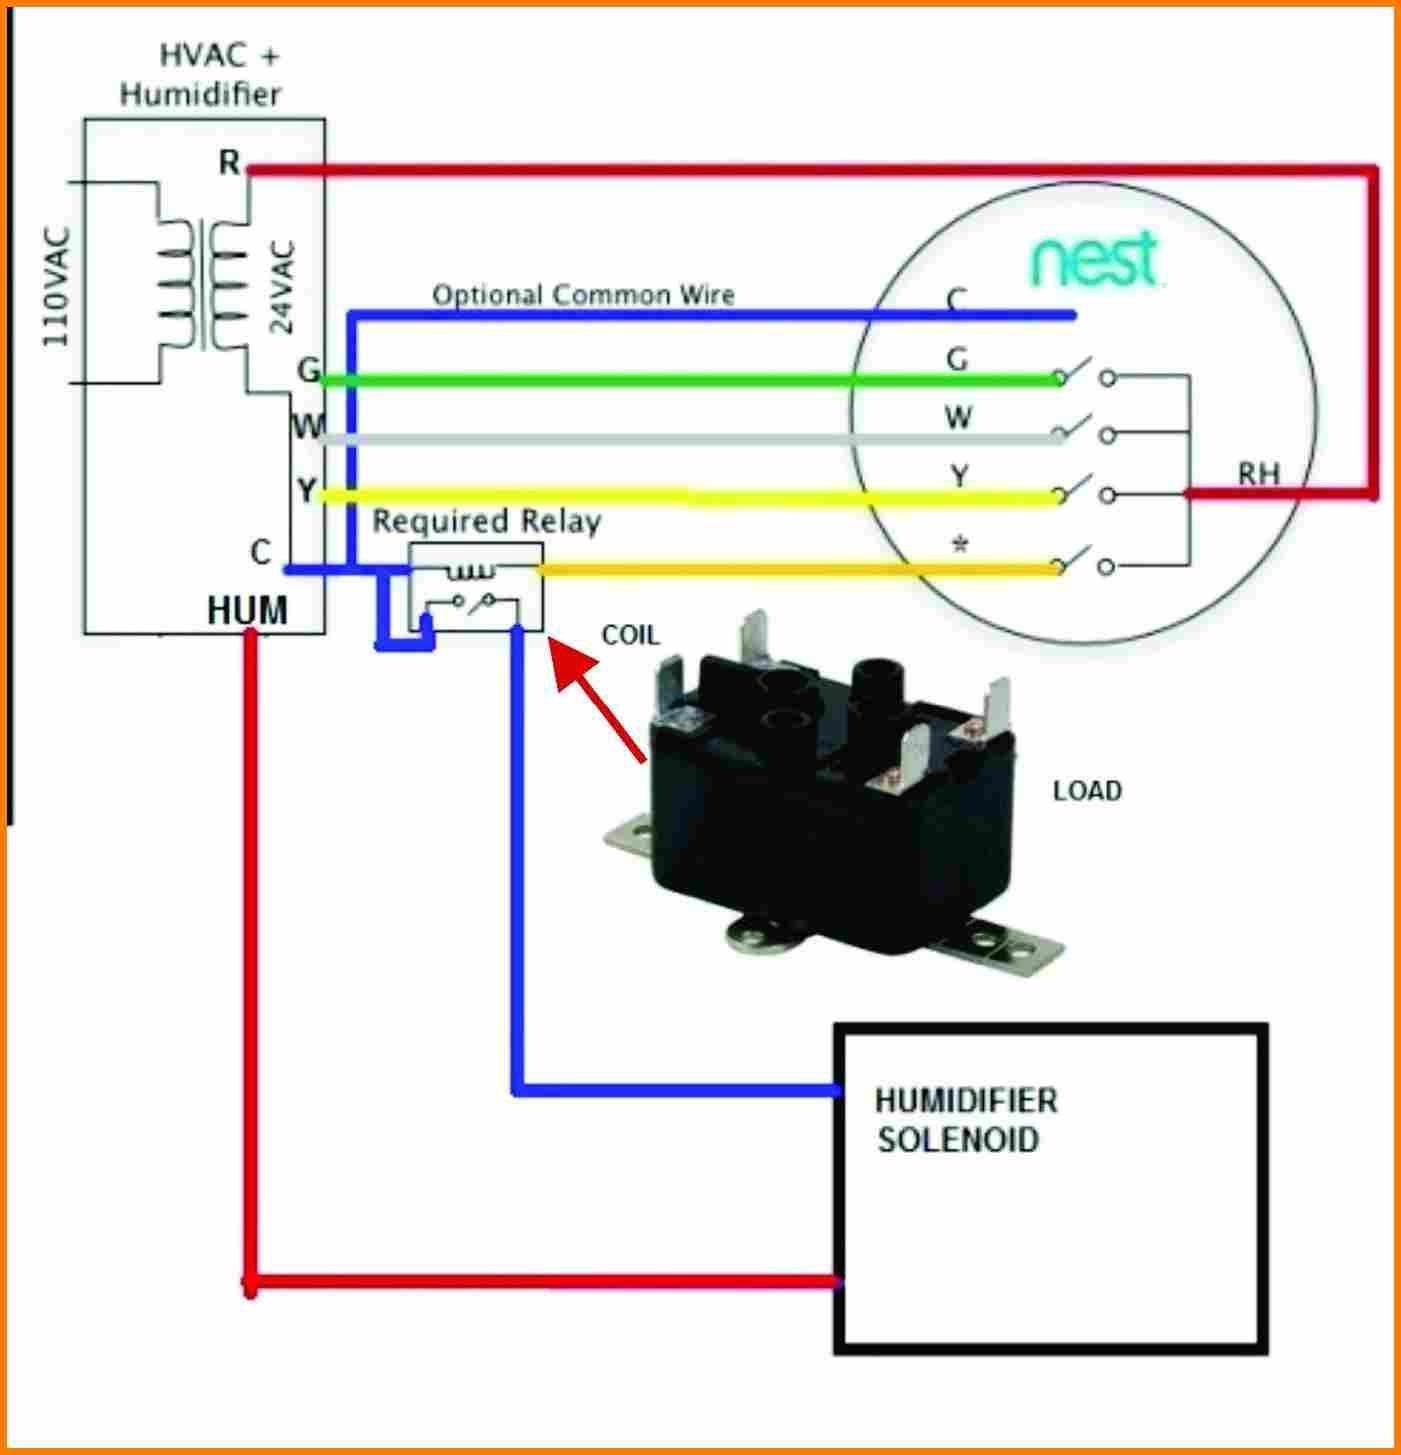 NC_1672] Trueease He250 Nest Wiring Trane Xv90 Doityourselfcom Community Wiring  DiagramMonoc Exmet Mohammedshrine Librar Wiring 101